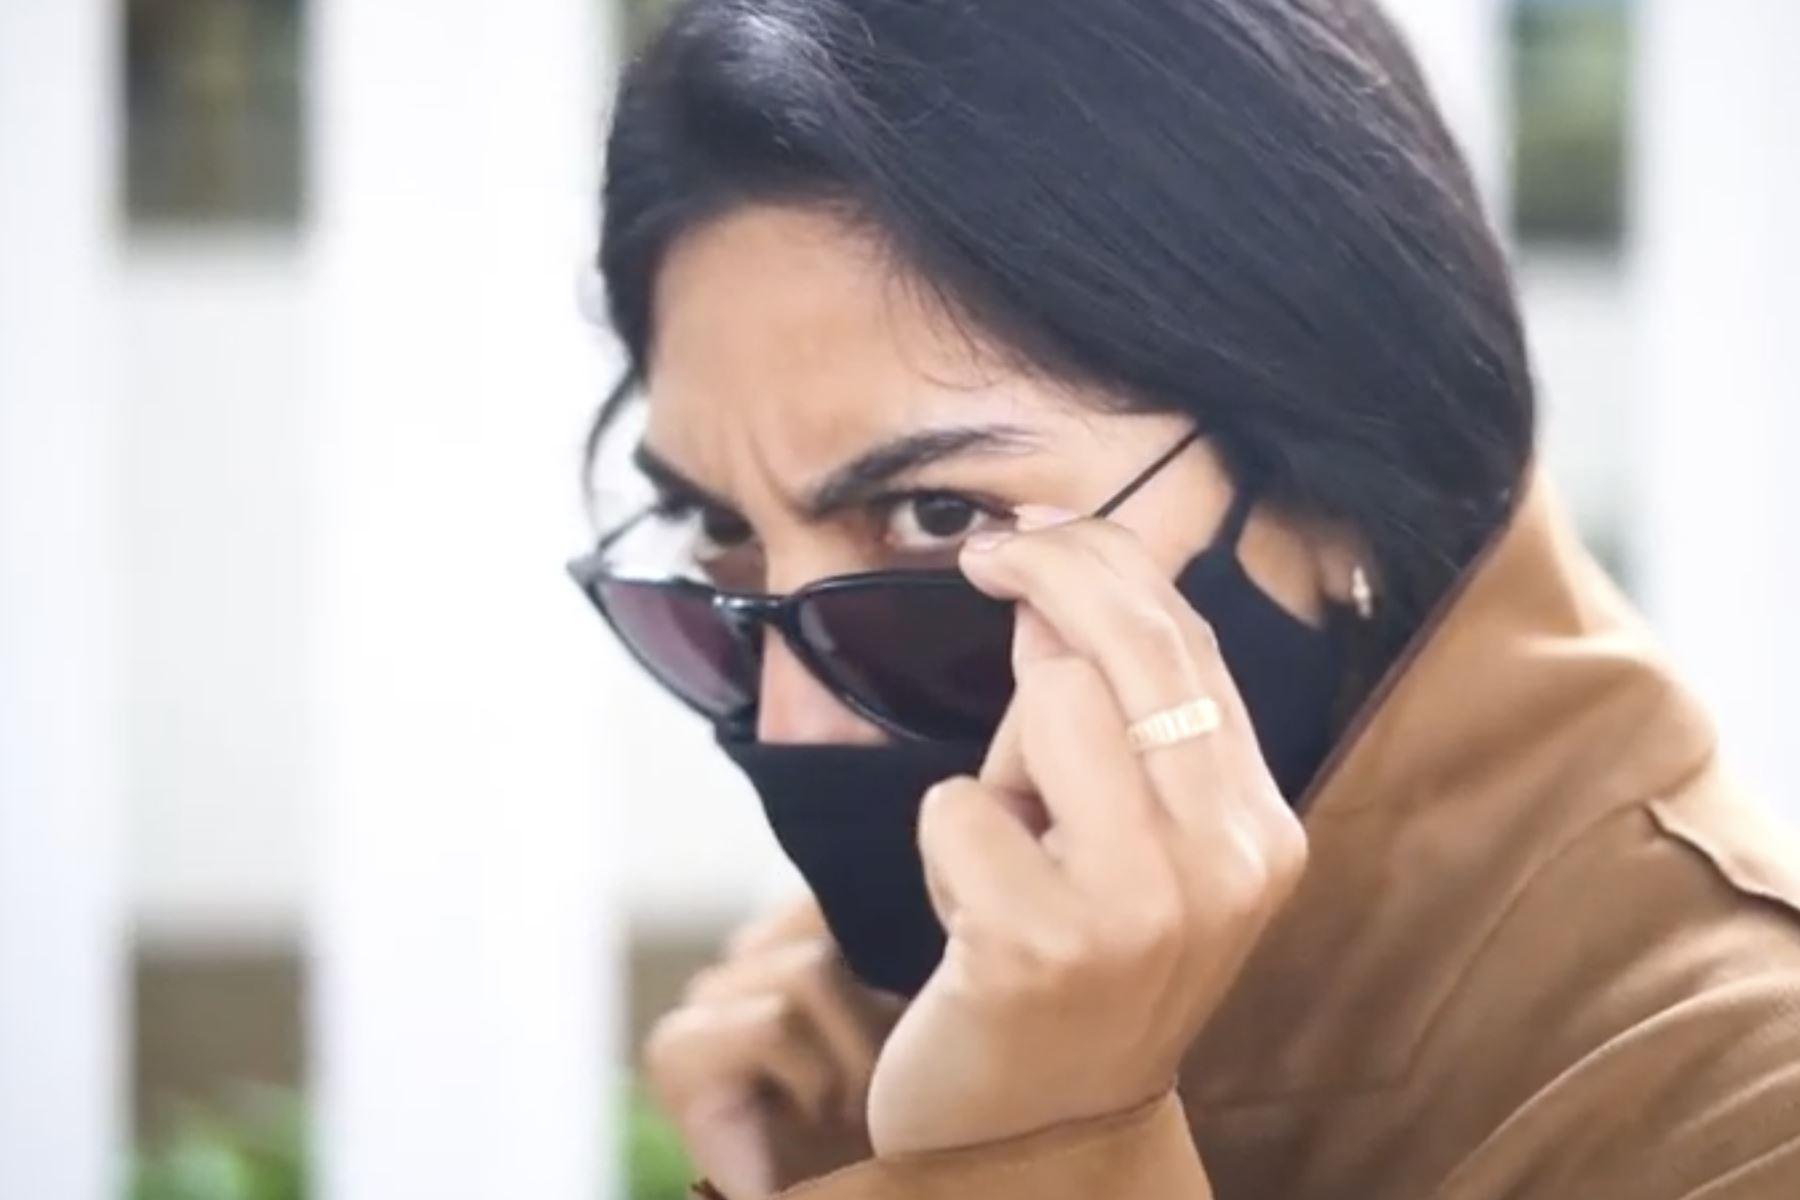 EsSalud: Tres de cada 10 parejas acude a consulta psicológica por celos descontrolados